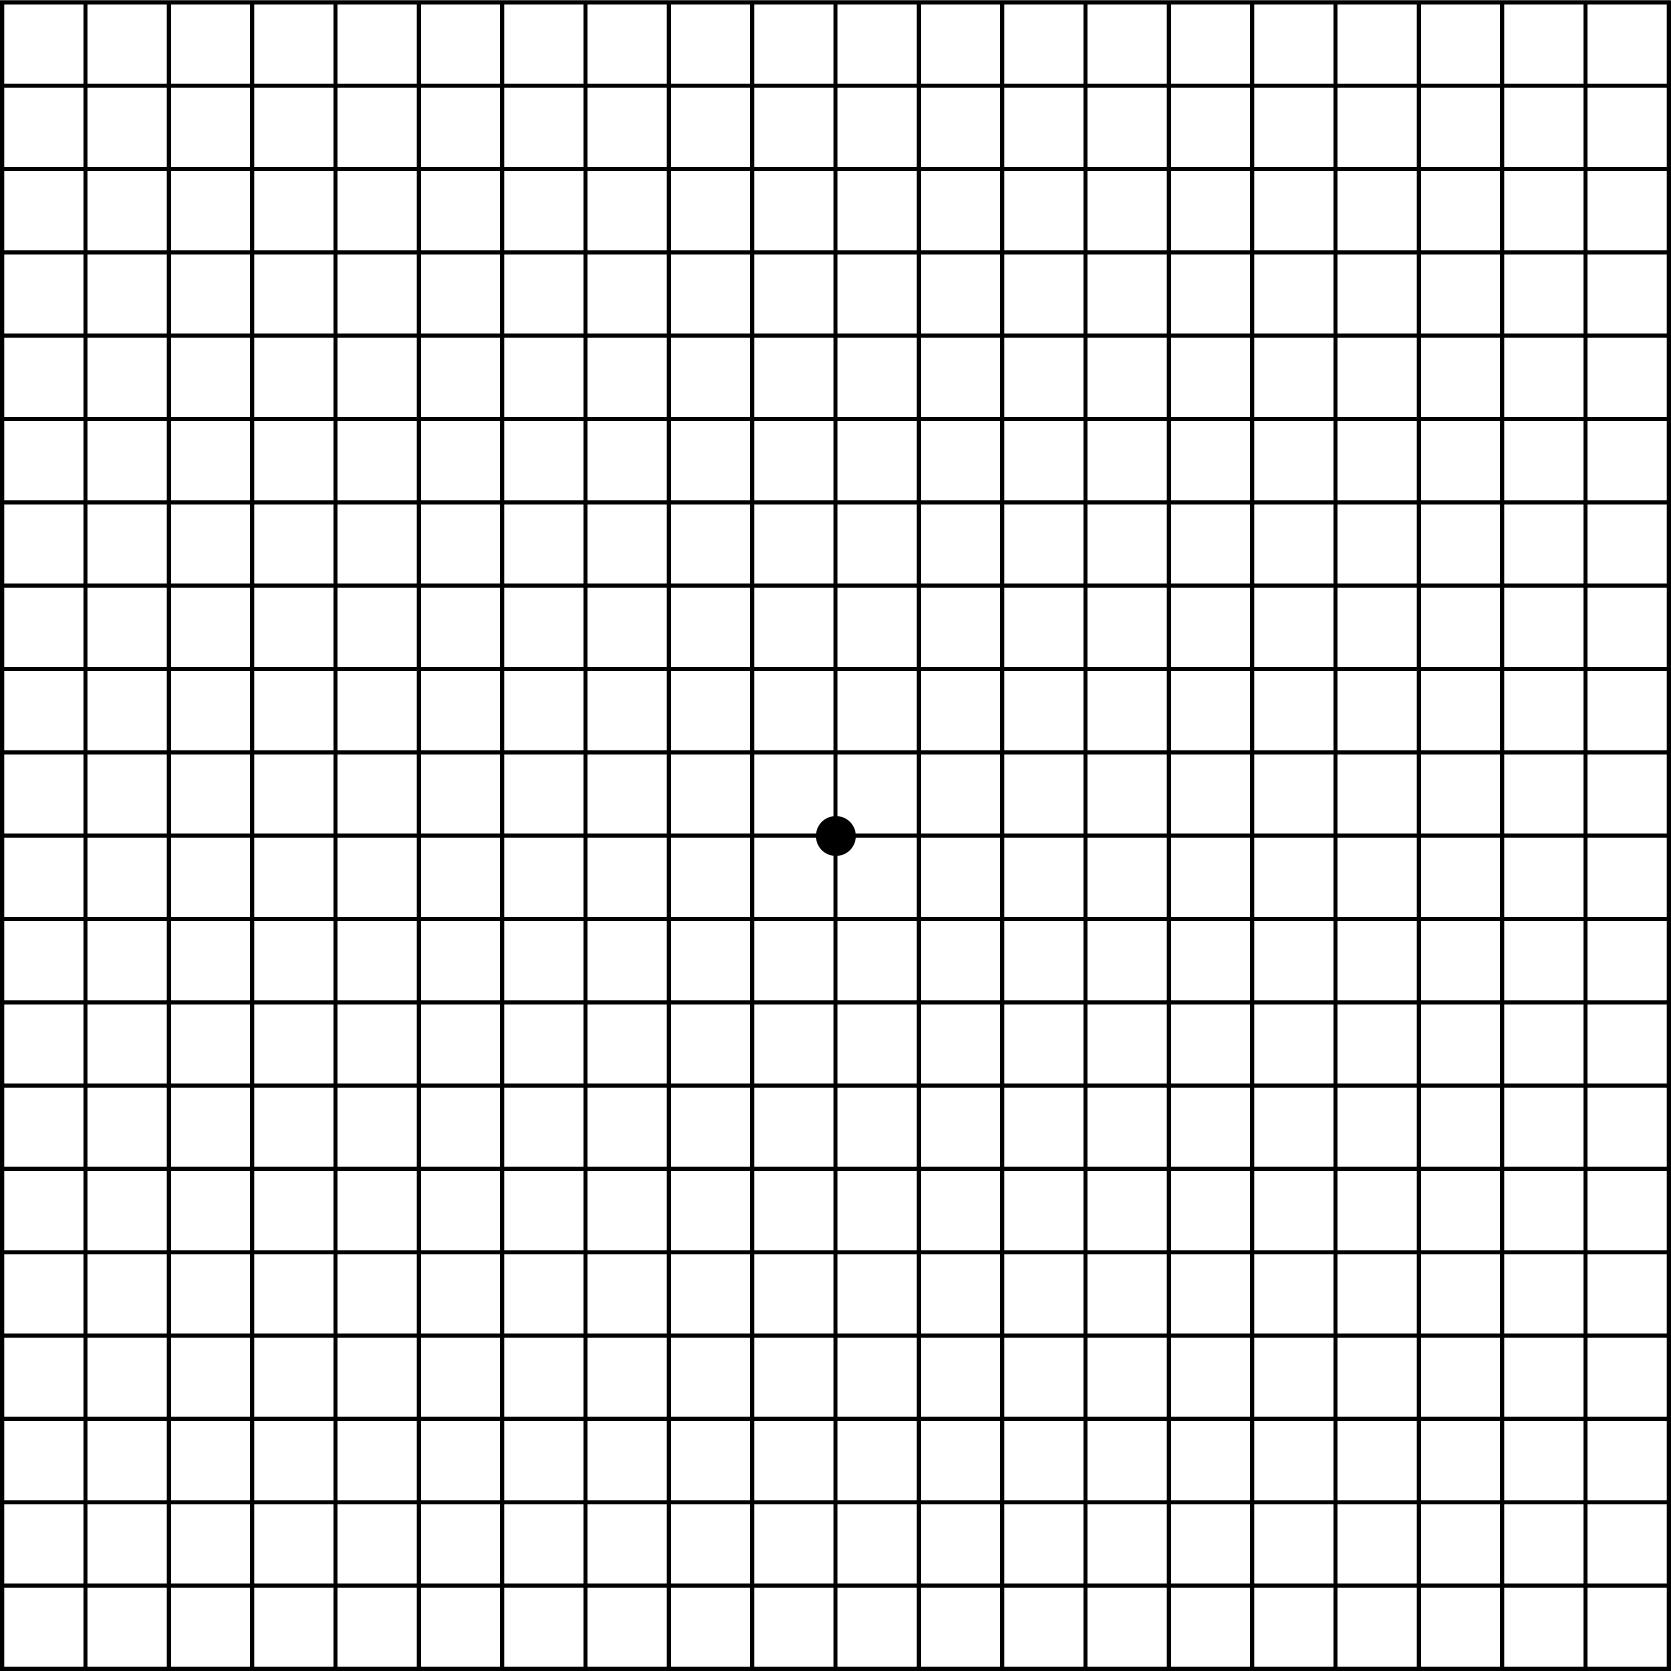 Post 3d Paper Templates 92821 as well 100x100 Grid JCVBWzojAnMR1LW7YTTGALJguLfgeXxxBKeqvxXcNdI also Hexagon Templates likewise JJBA Stat Sheet Template 614163667 moreover Cross Stitch Graph Paper. on blank graph template